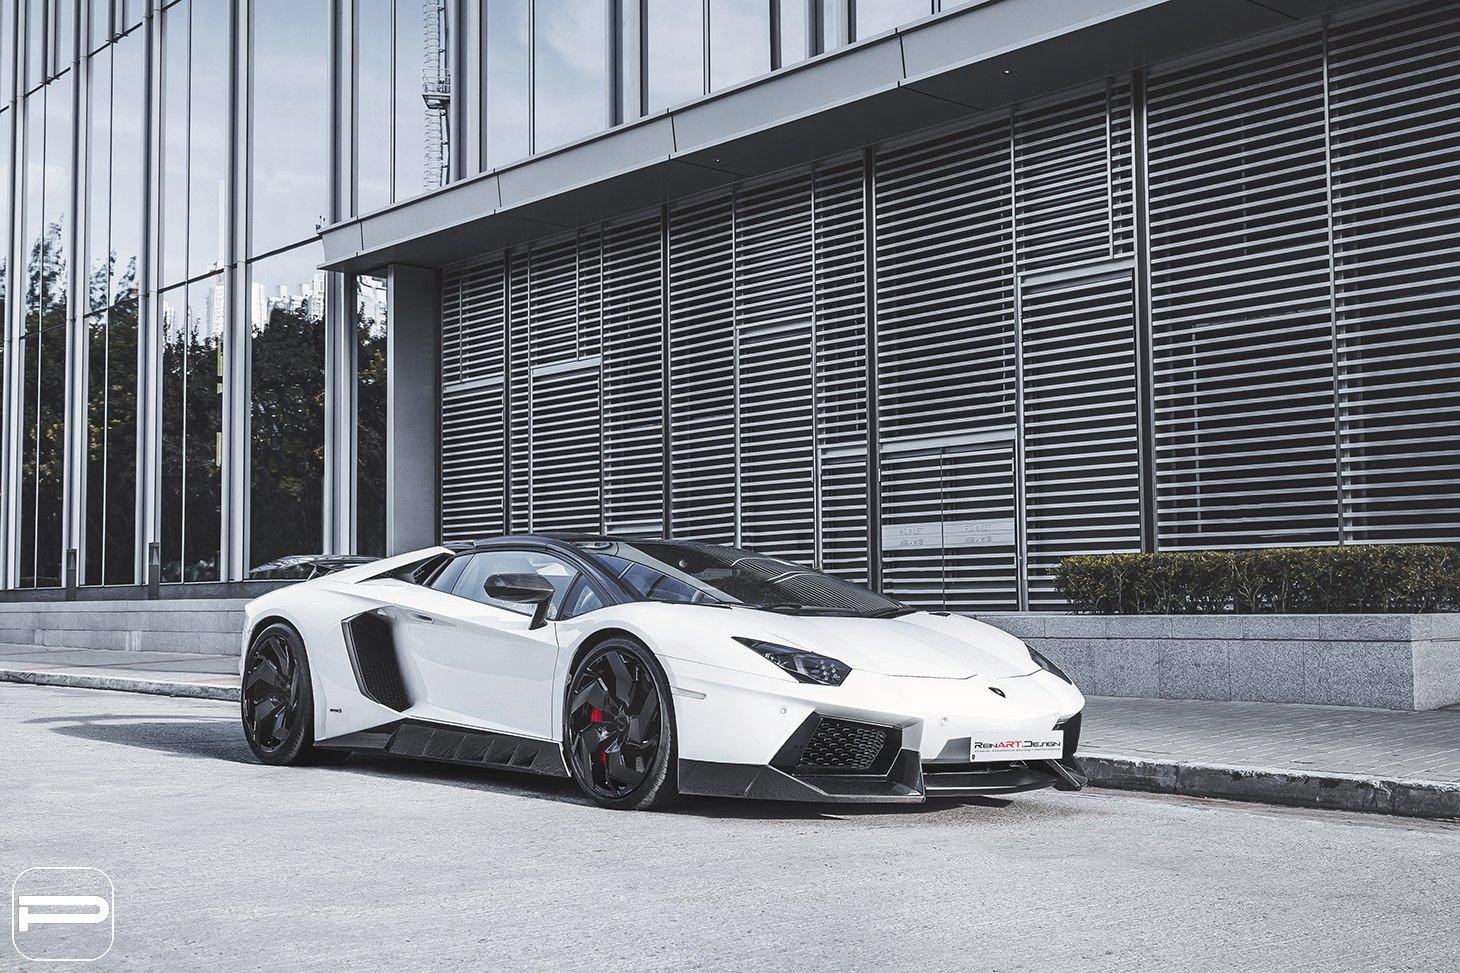 Nice and Proper Aero Kit for White Lamborghini Aventador ...